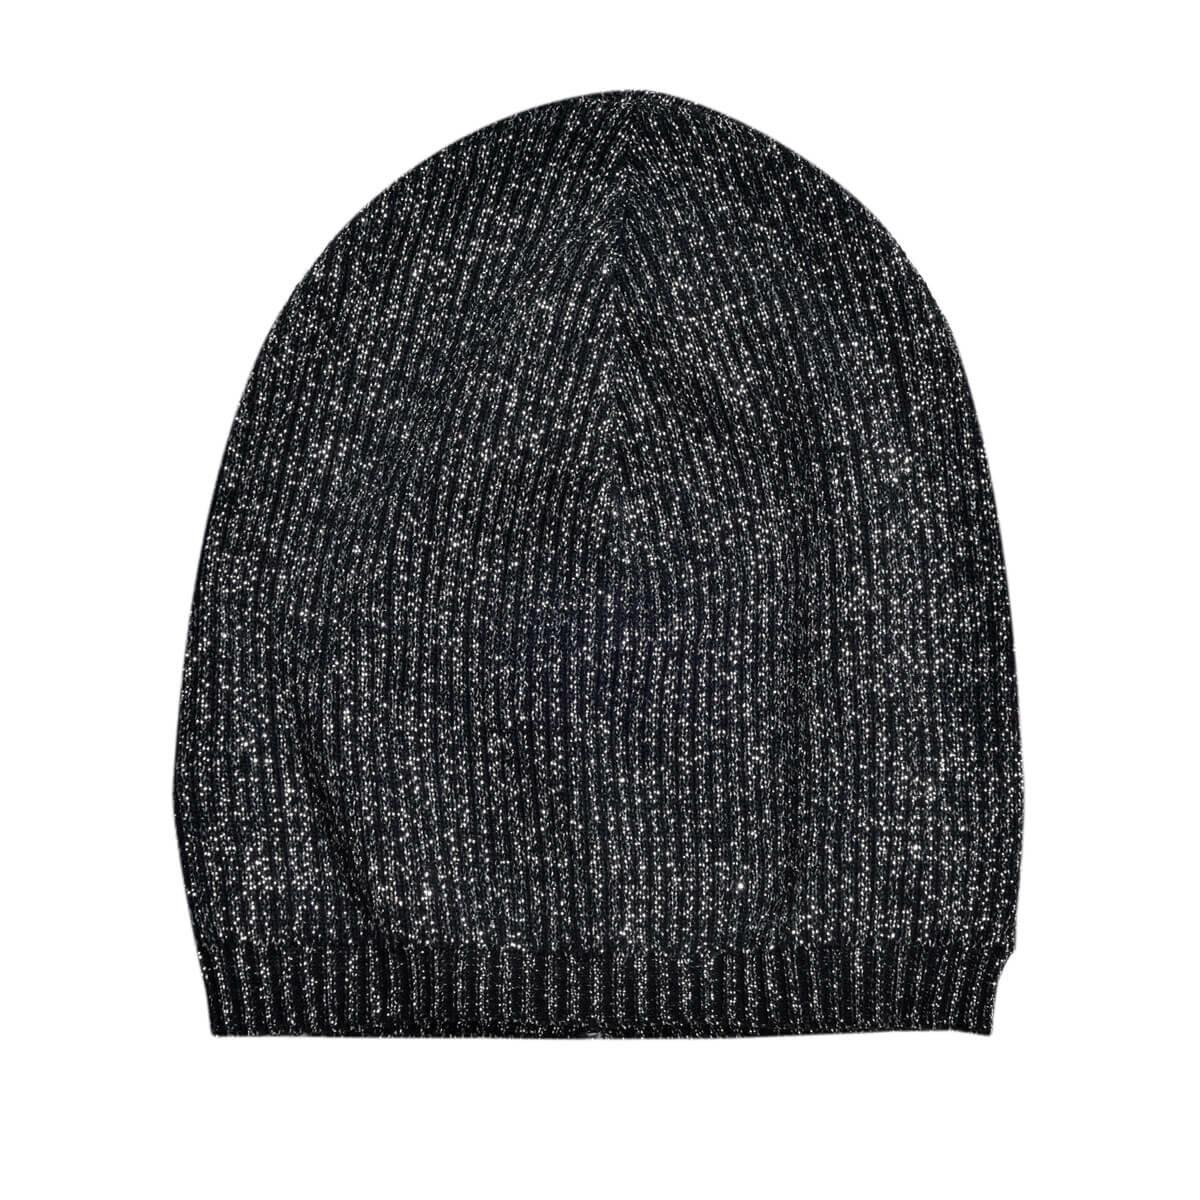 FLO SIM BEANIE negro mujer sombrero señorita F